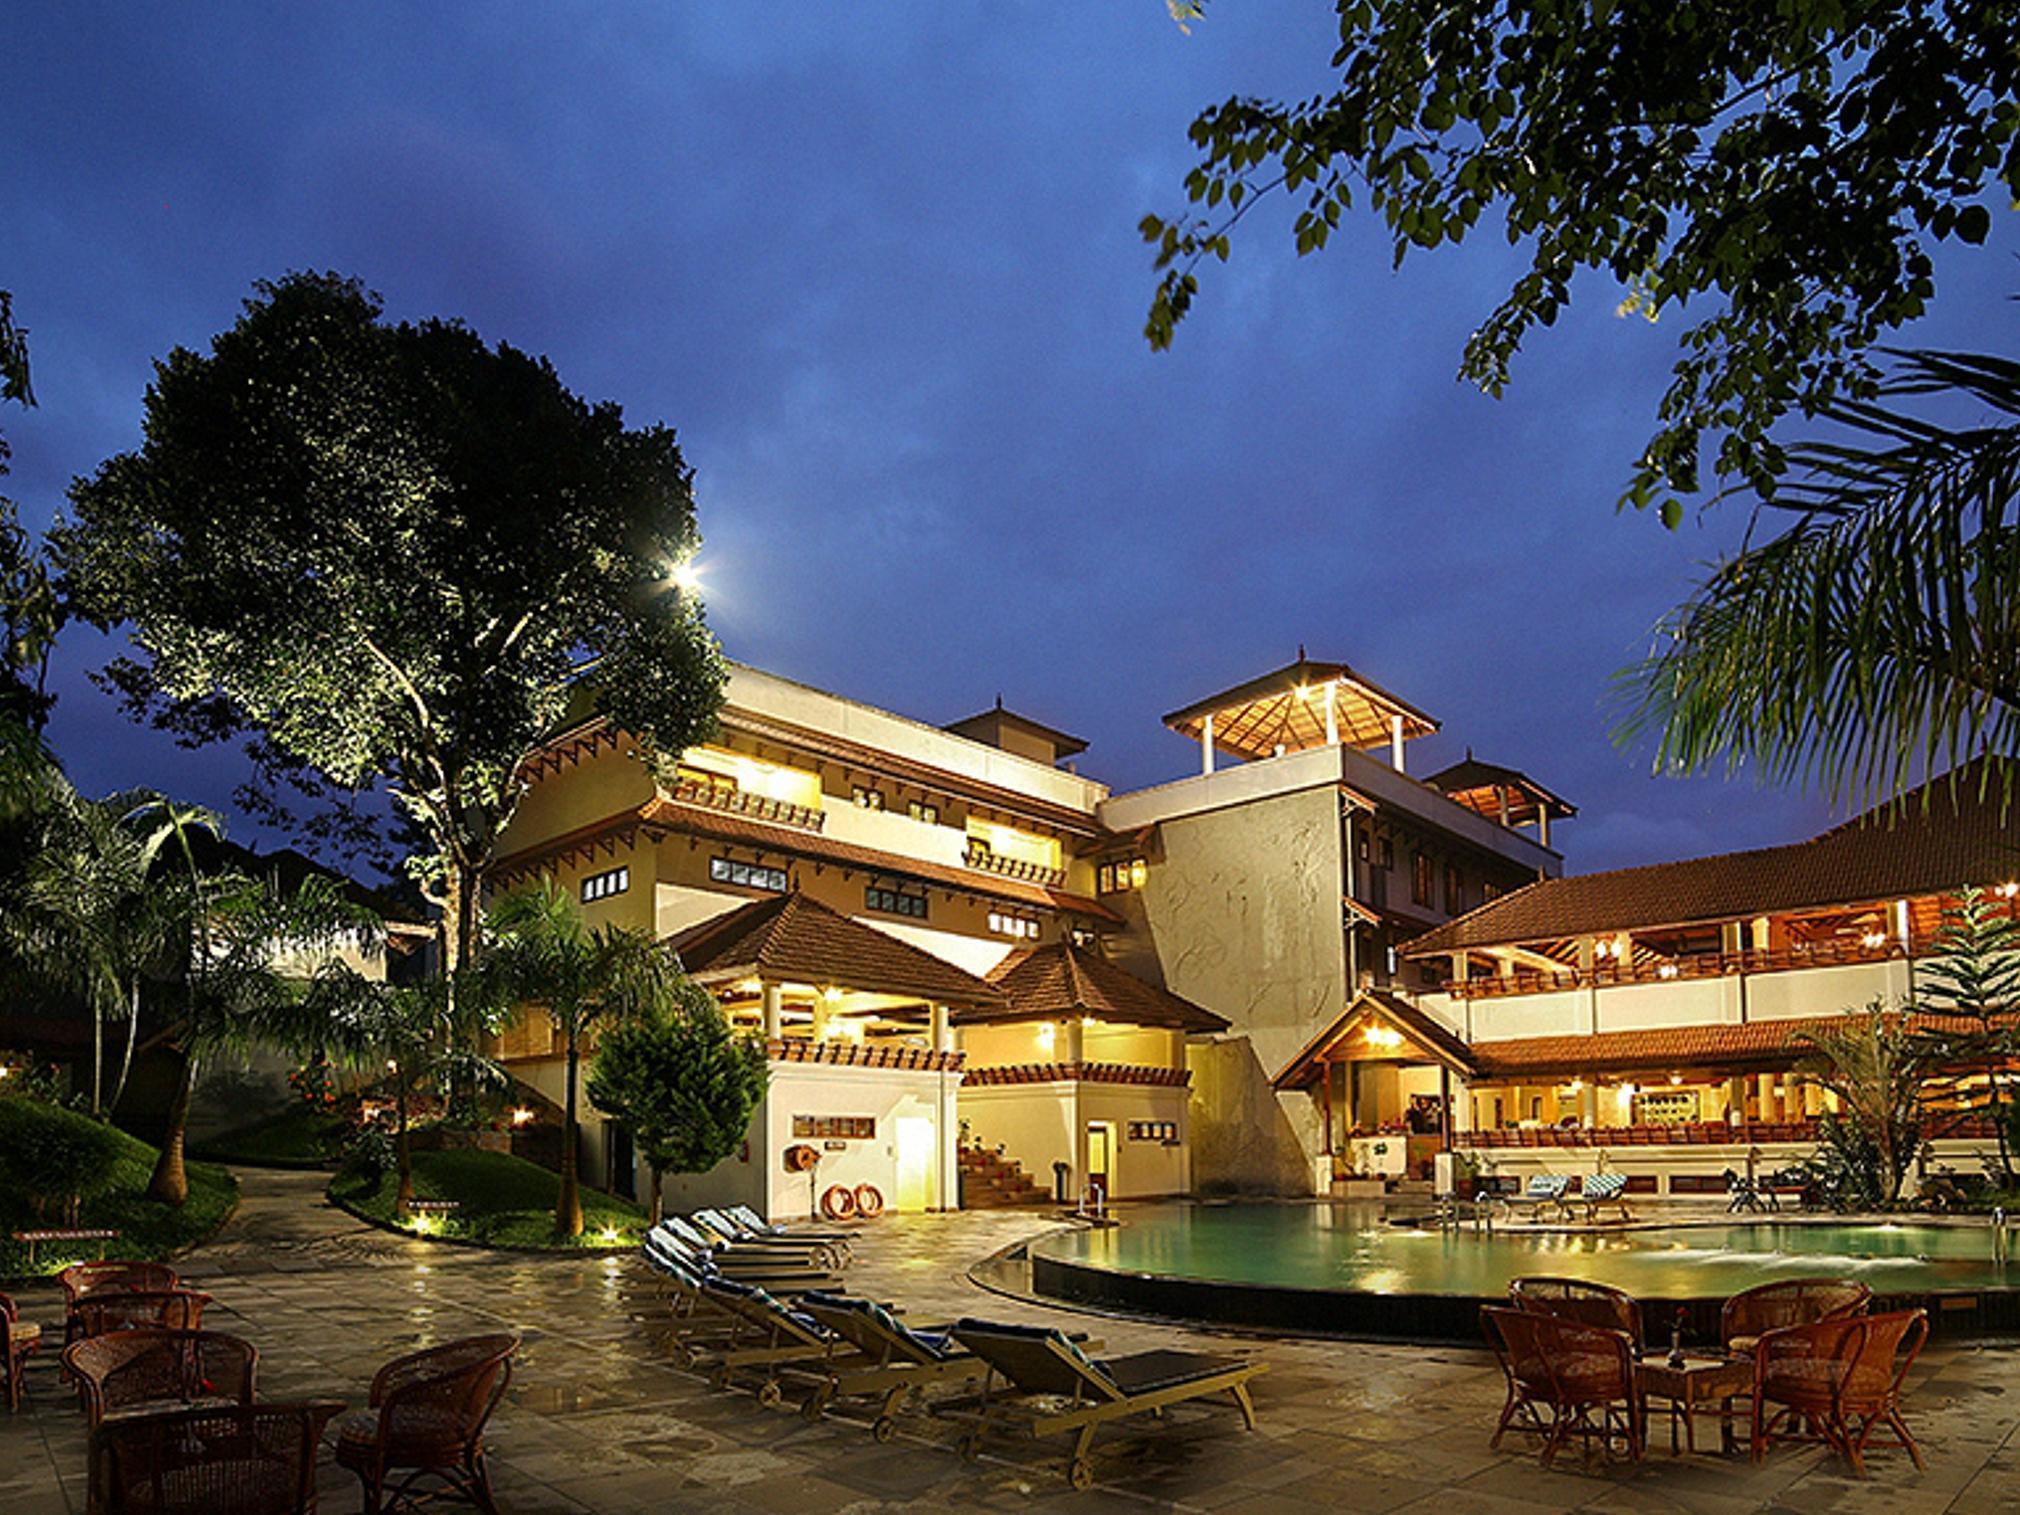 The Elephant Court Resort